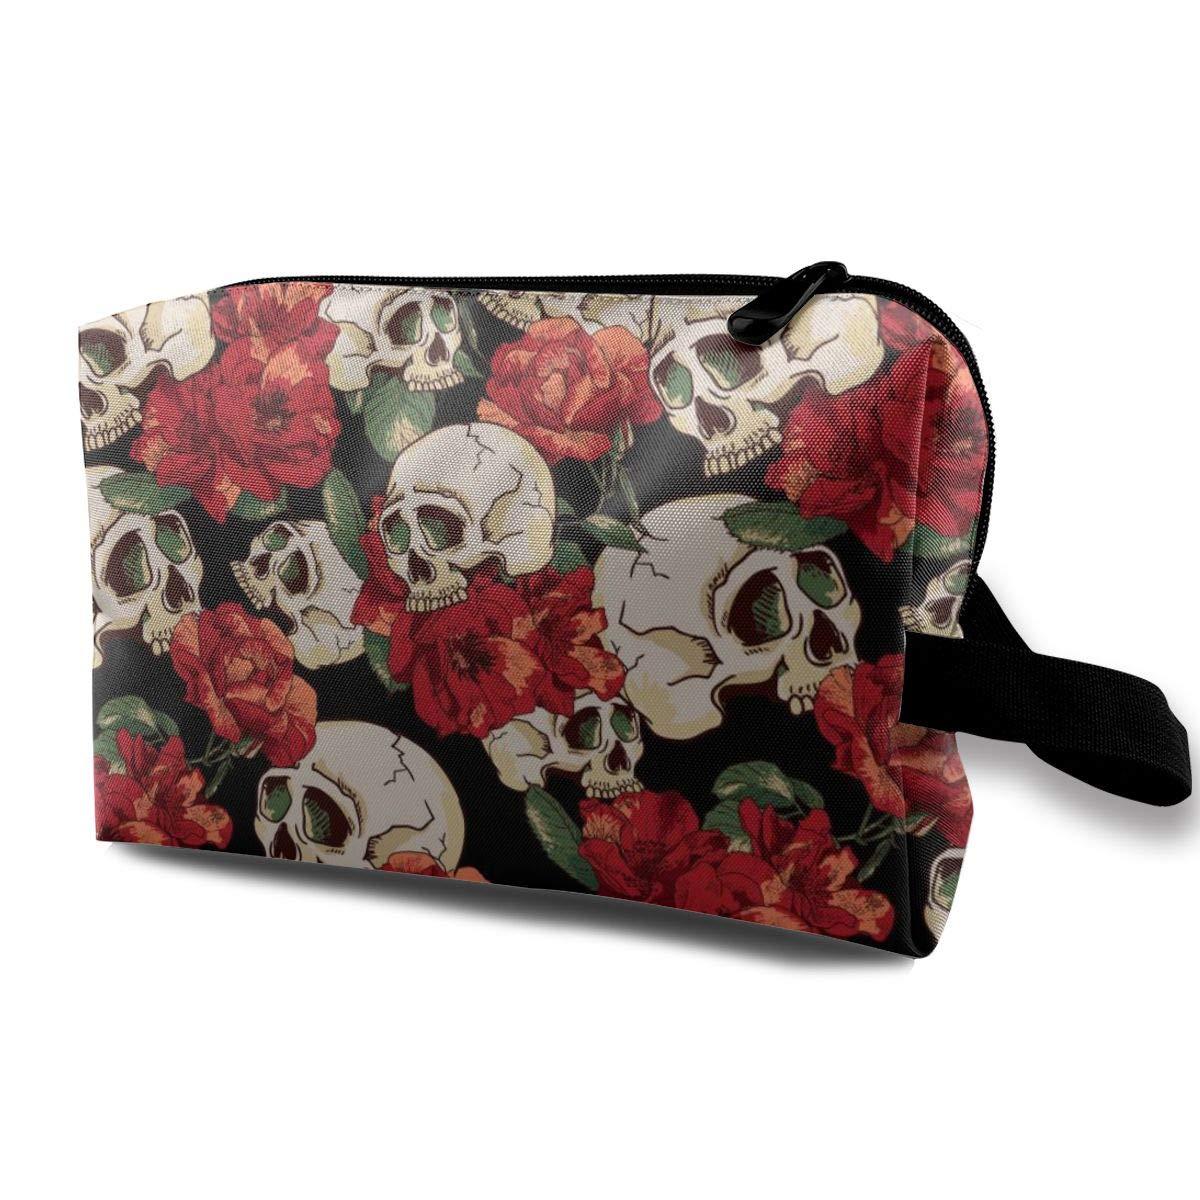 Red Flower Sugar Skull Pattern Cosmetic Bag Adorable Roomy Makeup Bags Travel Waterproof Toiletry Bag Accessories Organizer for Women Men Kid